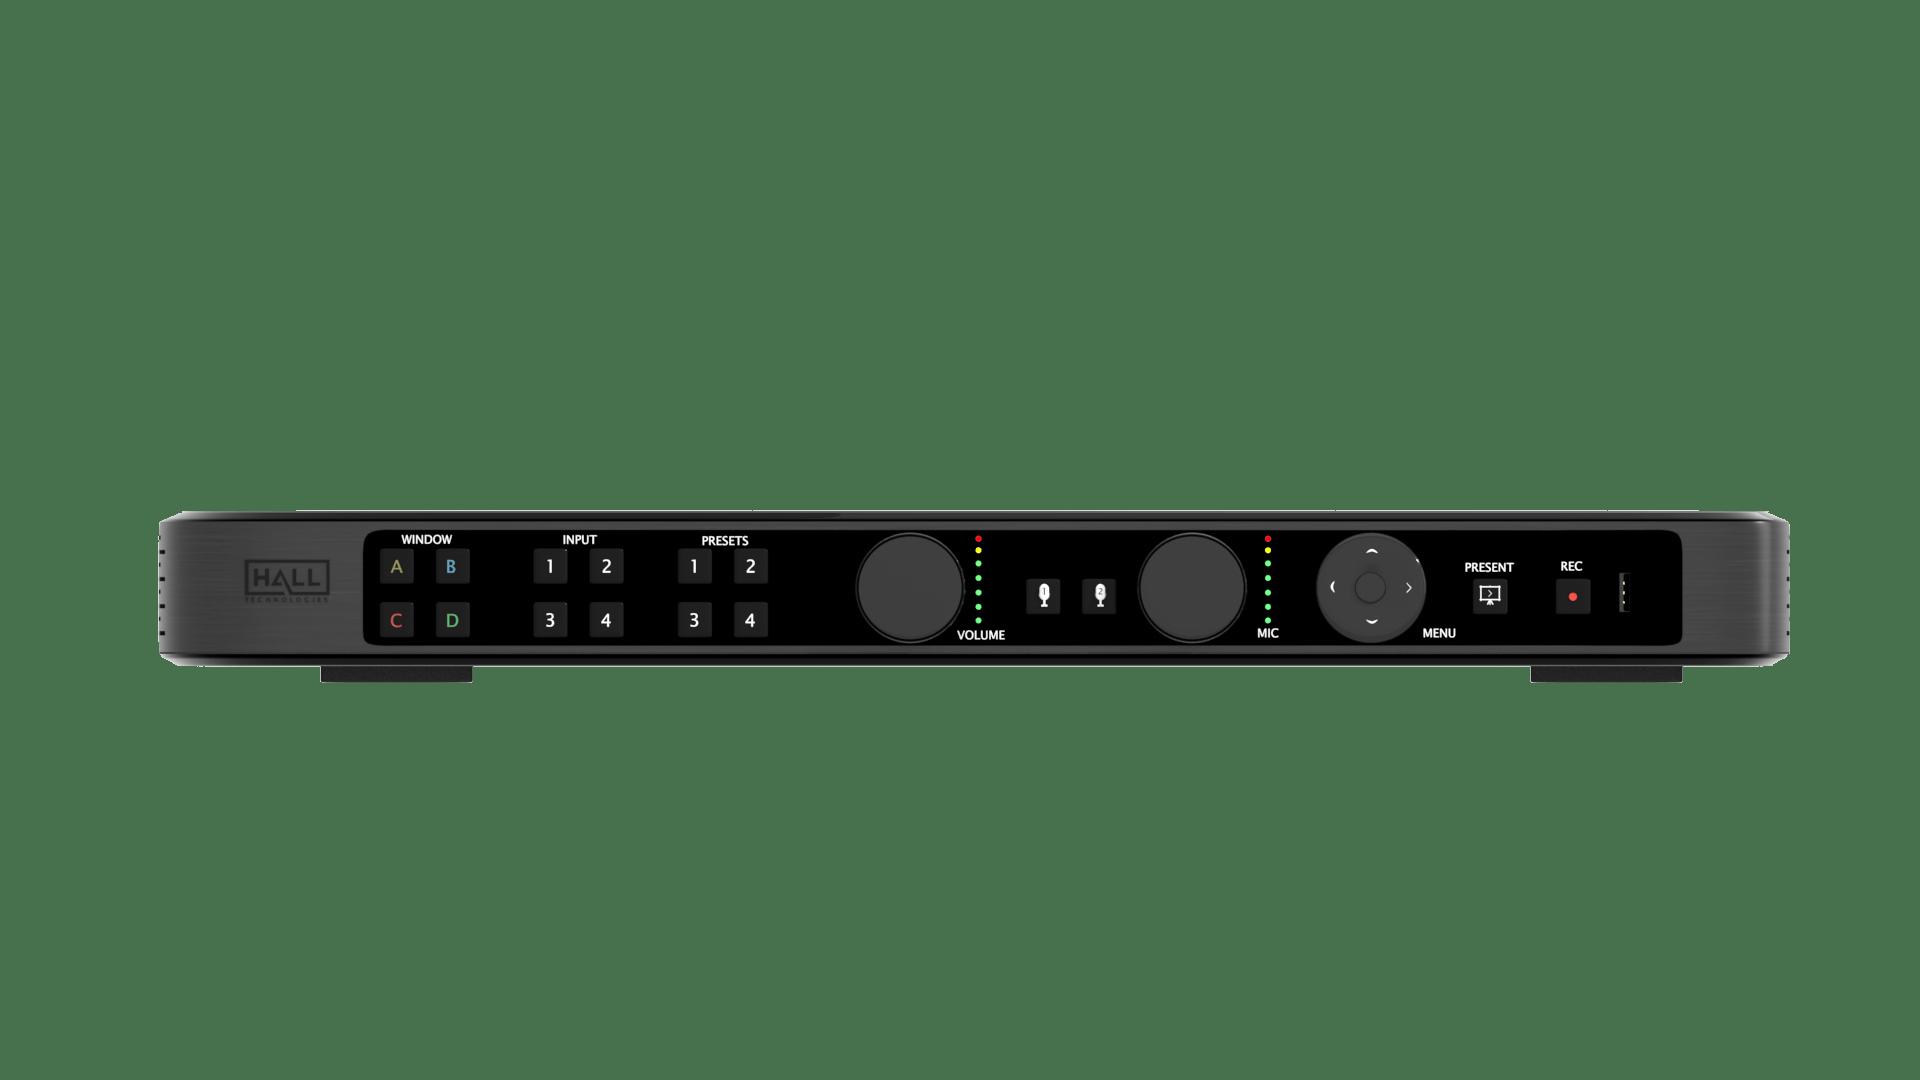 Hall EMCEE200 Seamless Multiview Presentation Switcher